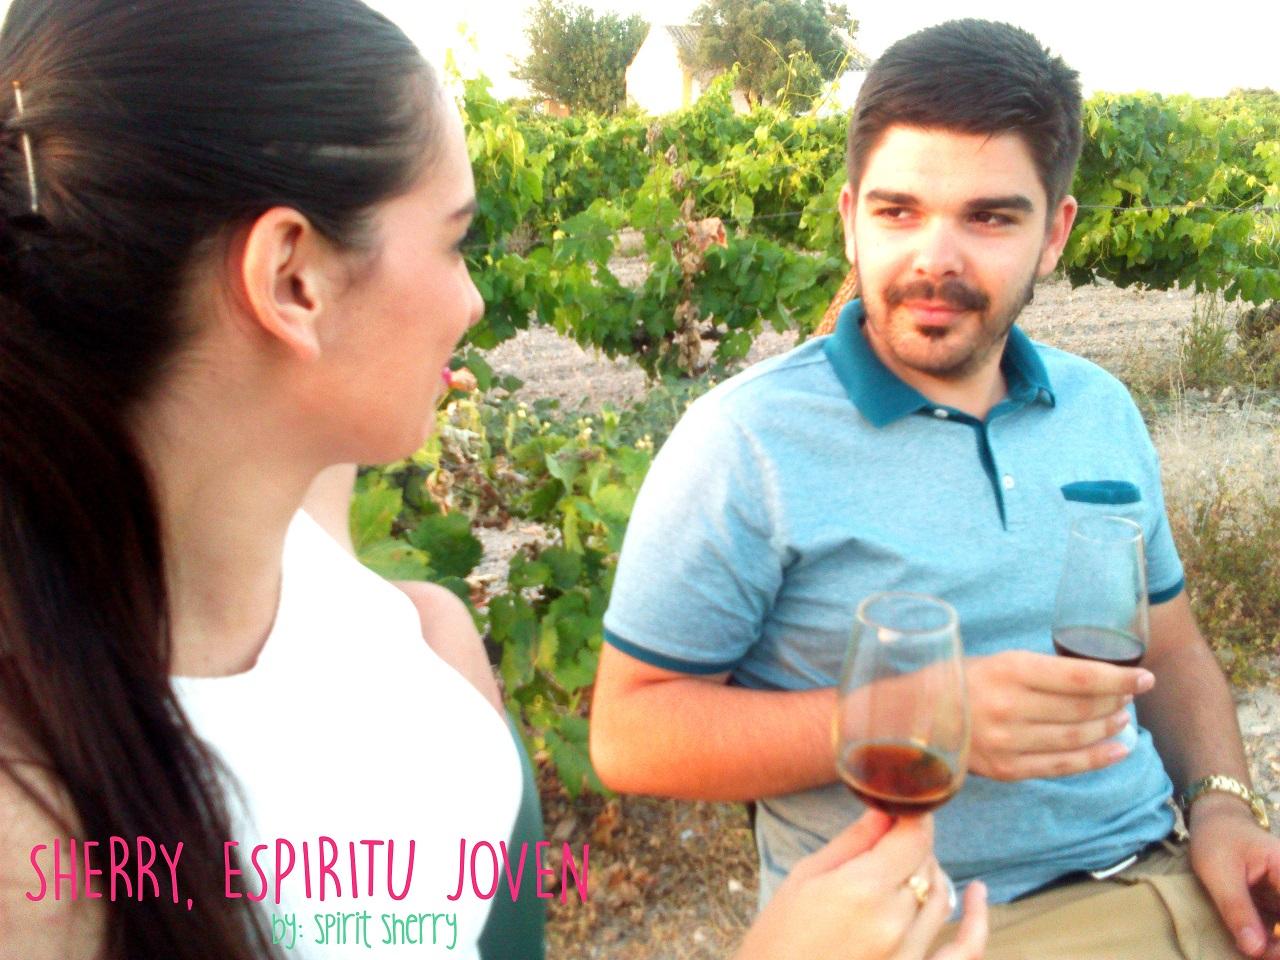 Spirit Sherry – Enoturismo » Escapadas romanticas, declara tu amor ...